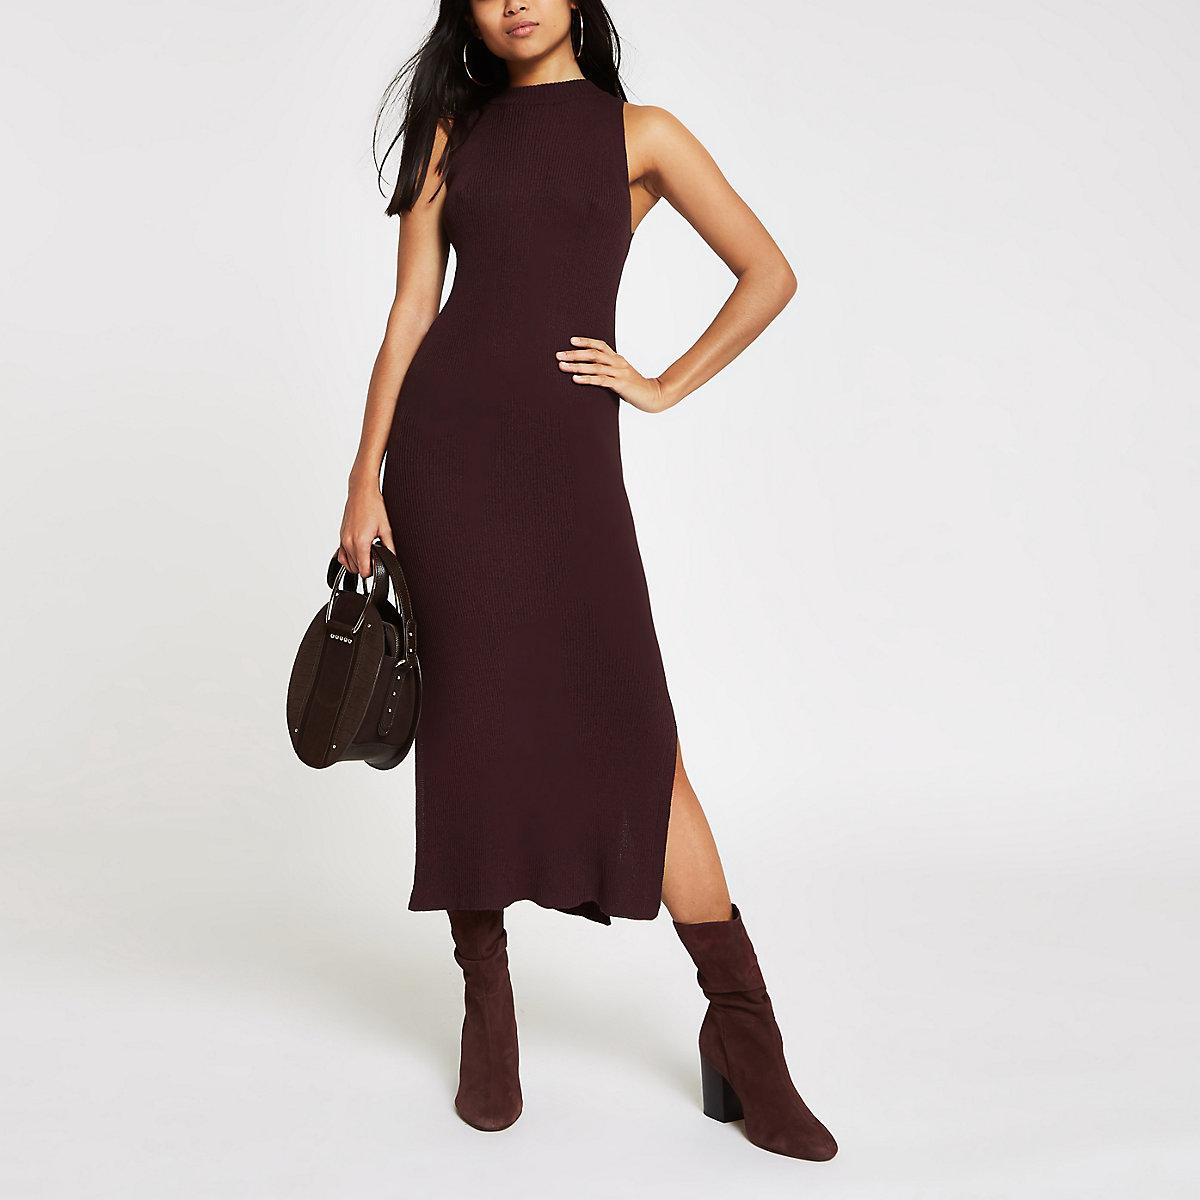 Petite brown knit sleeveless midi dress